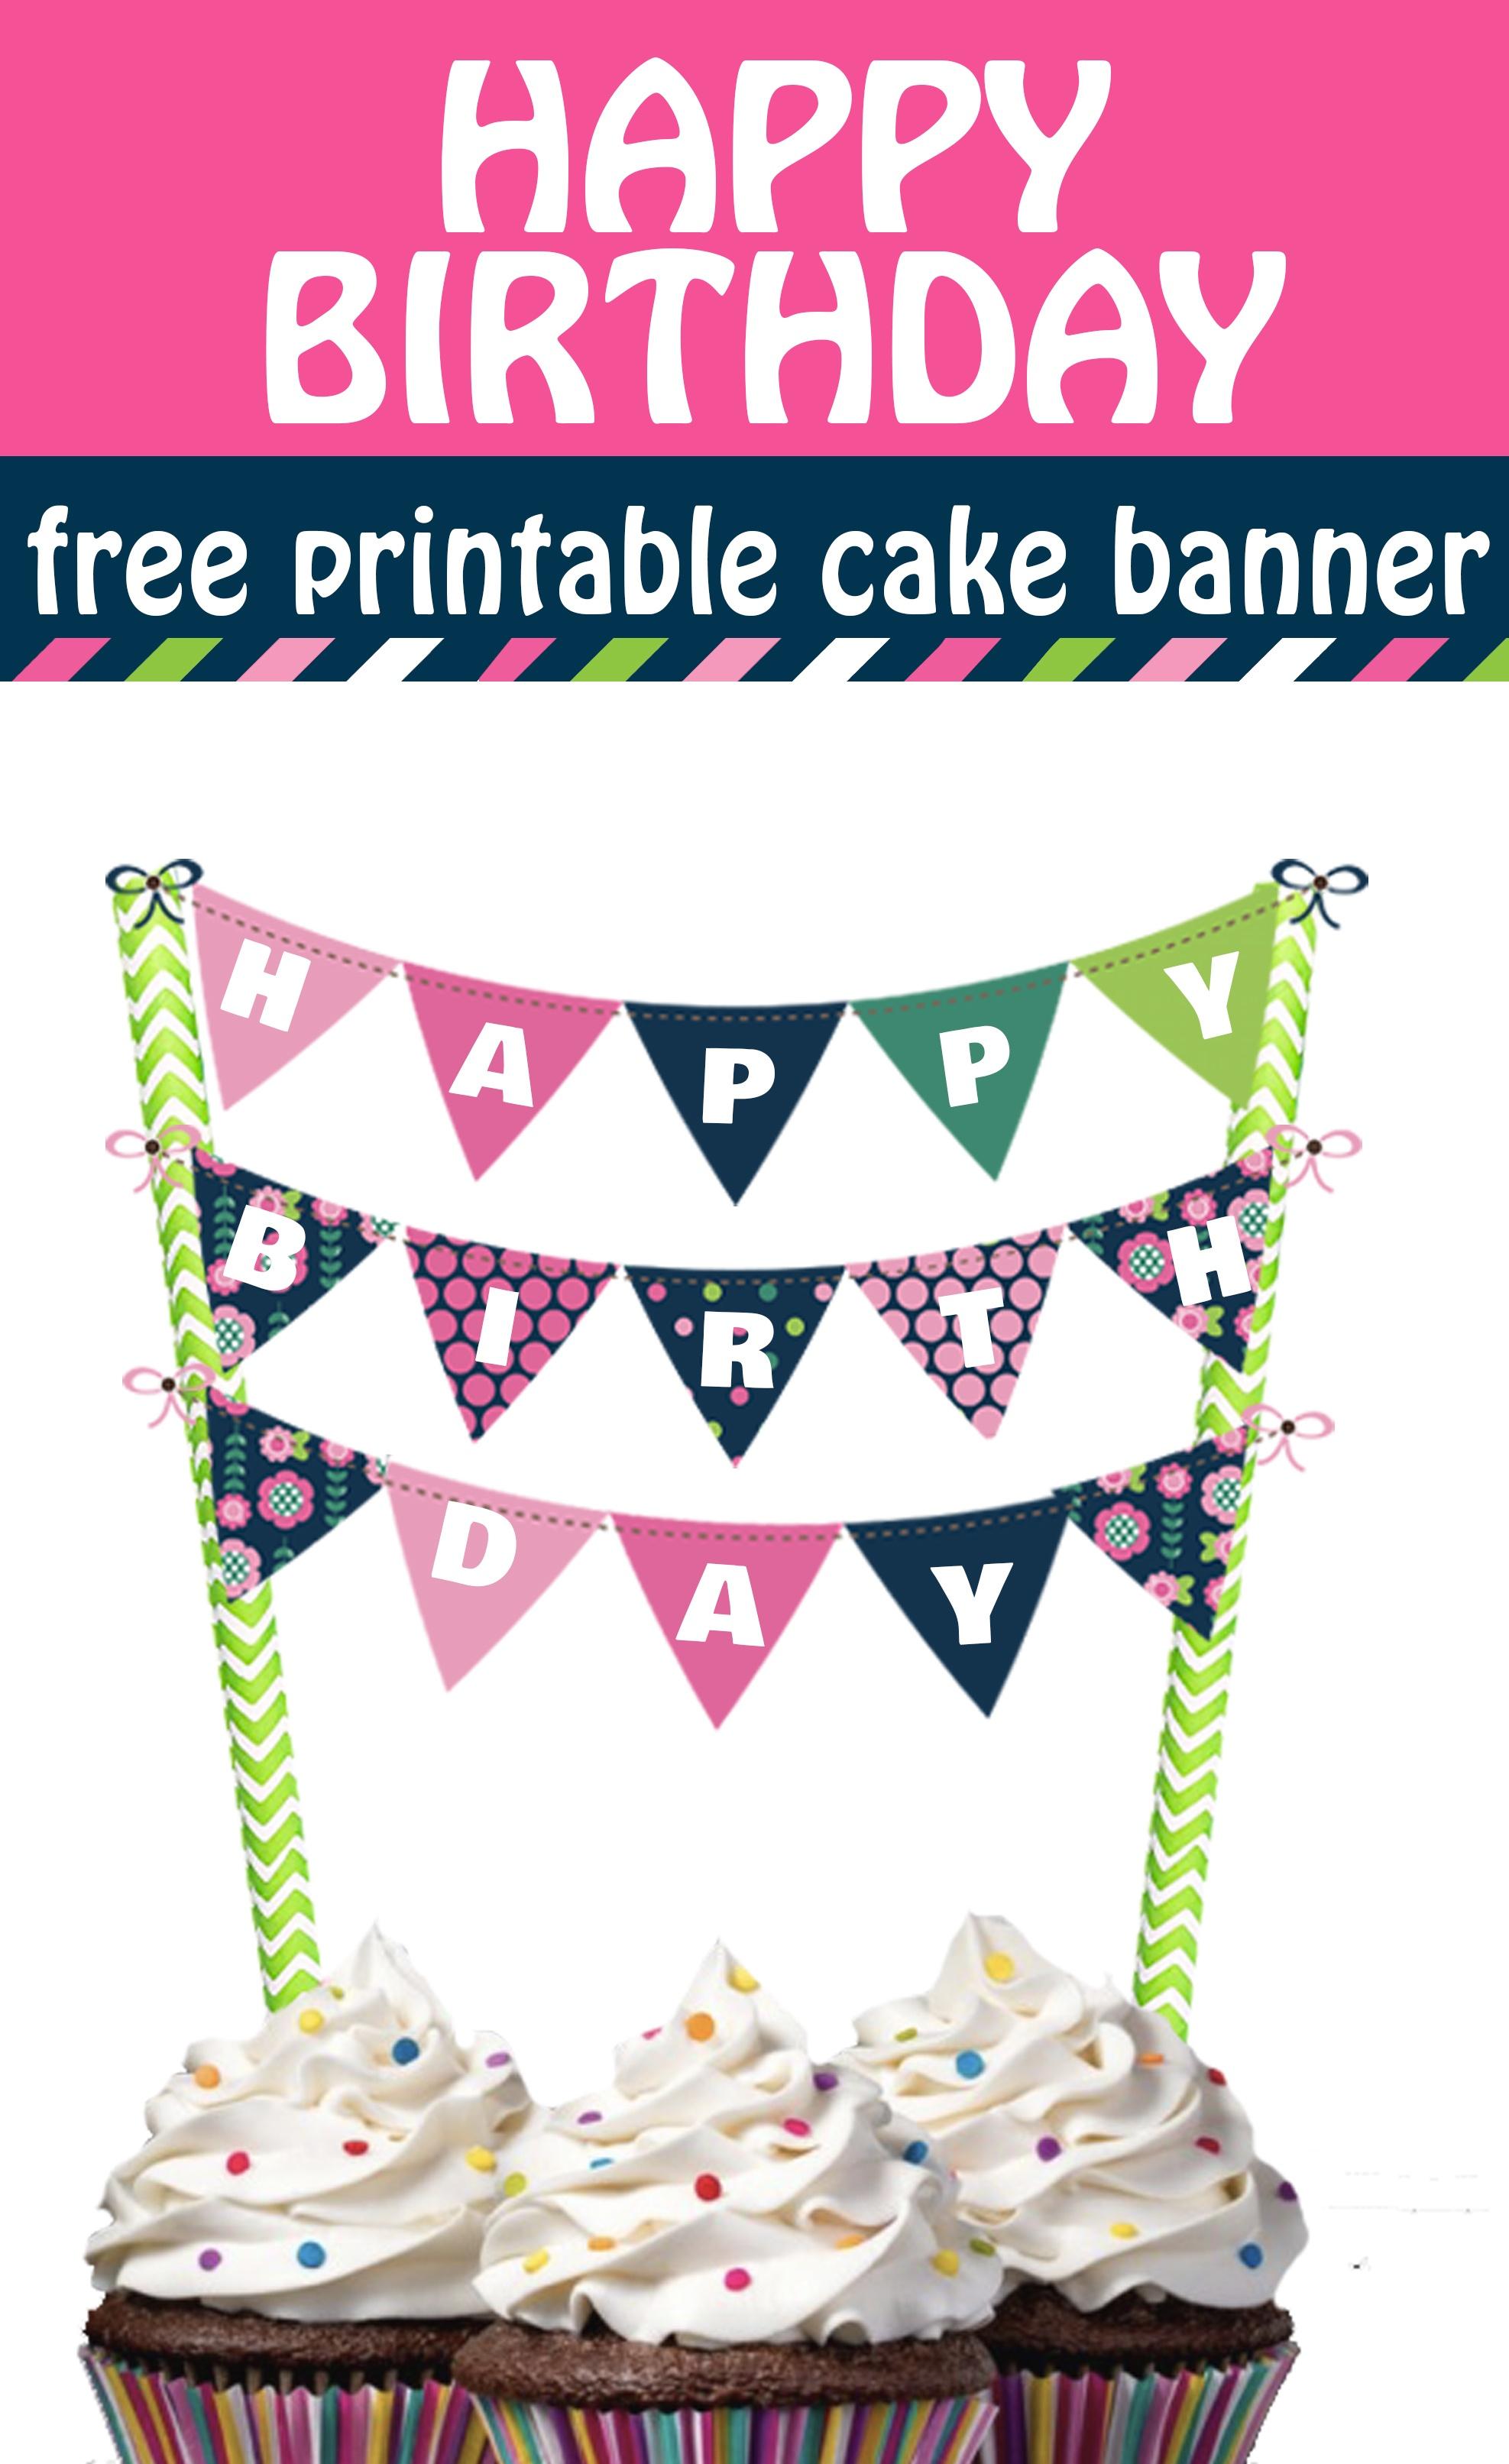 Cheerful And Bright Happy Birthday Cake Banner Free Printable - Free Printable Birthday Cake